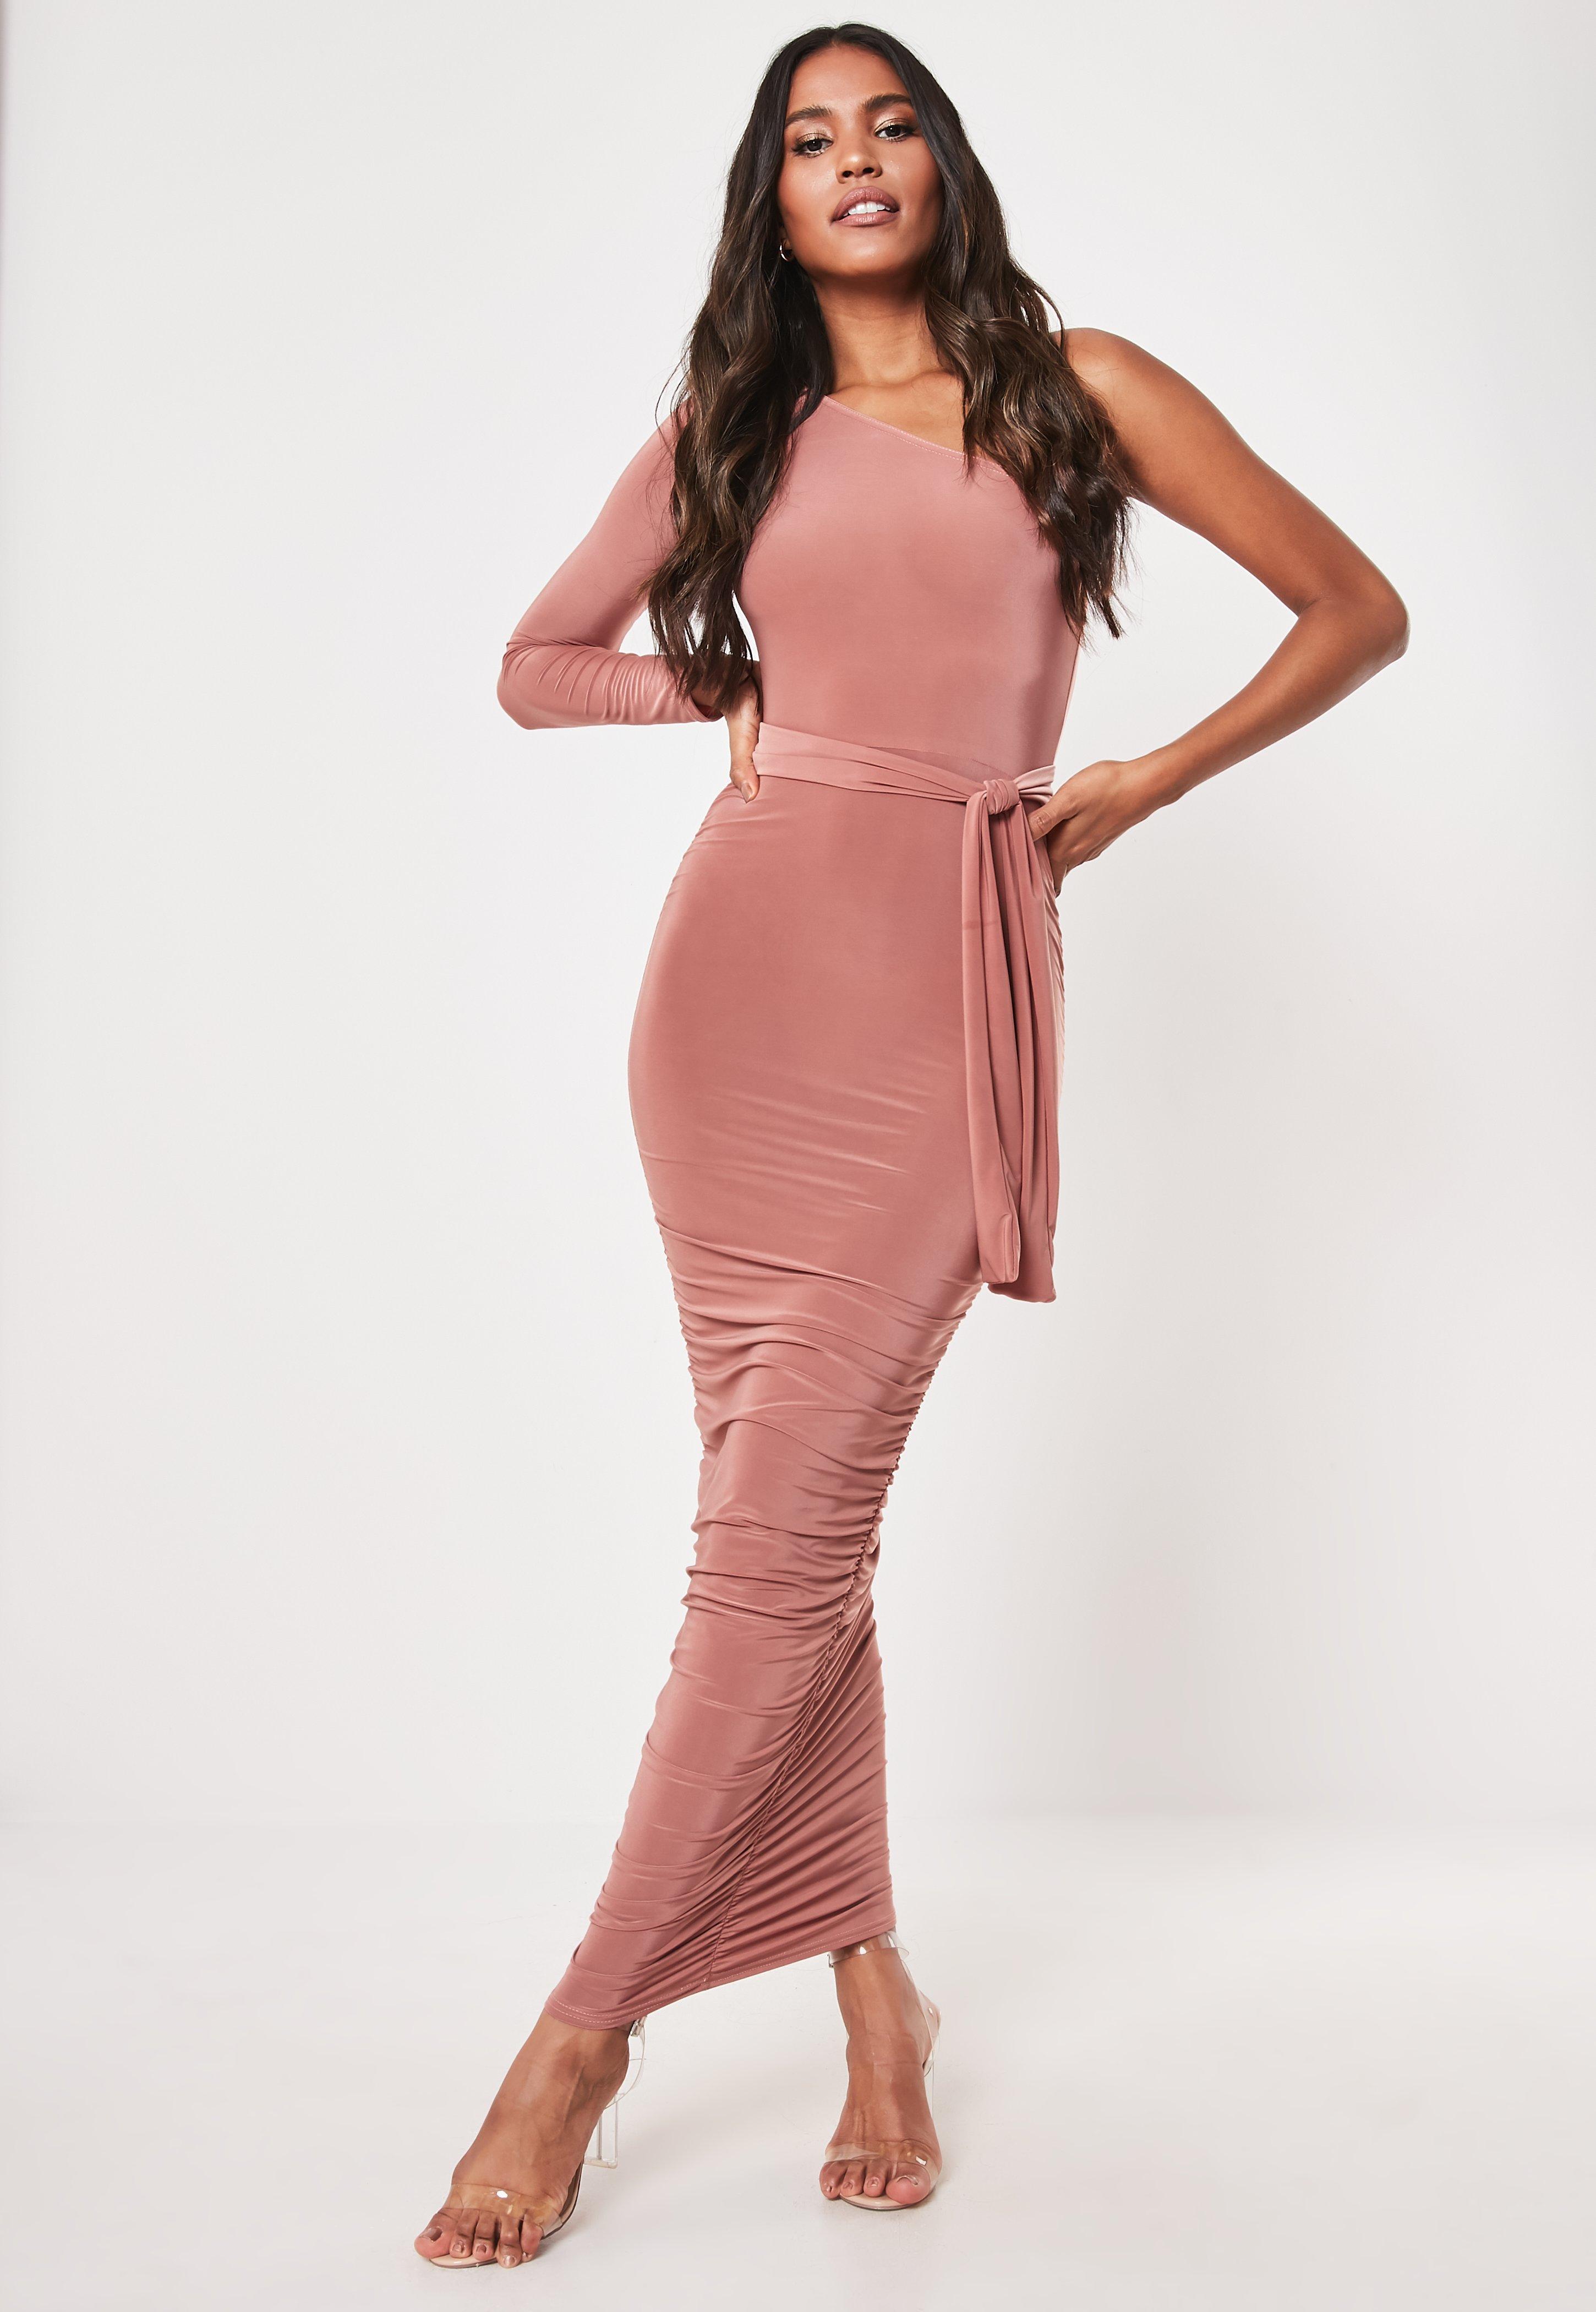 cfad75b677a5 Long Sleeve Dresses | Long Sleeve Maxi Dresses - Missguided